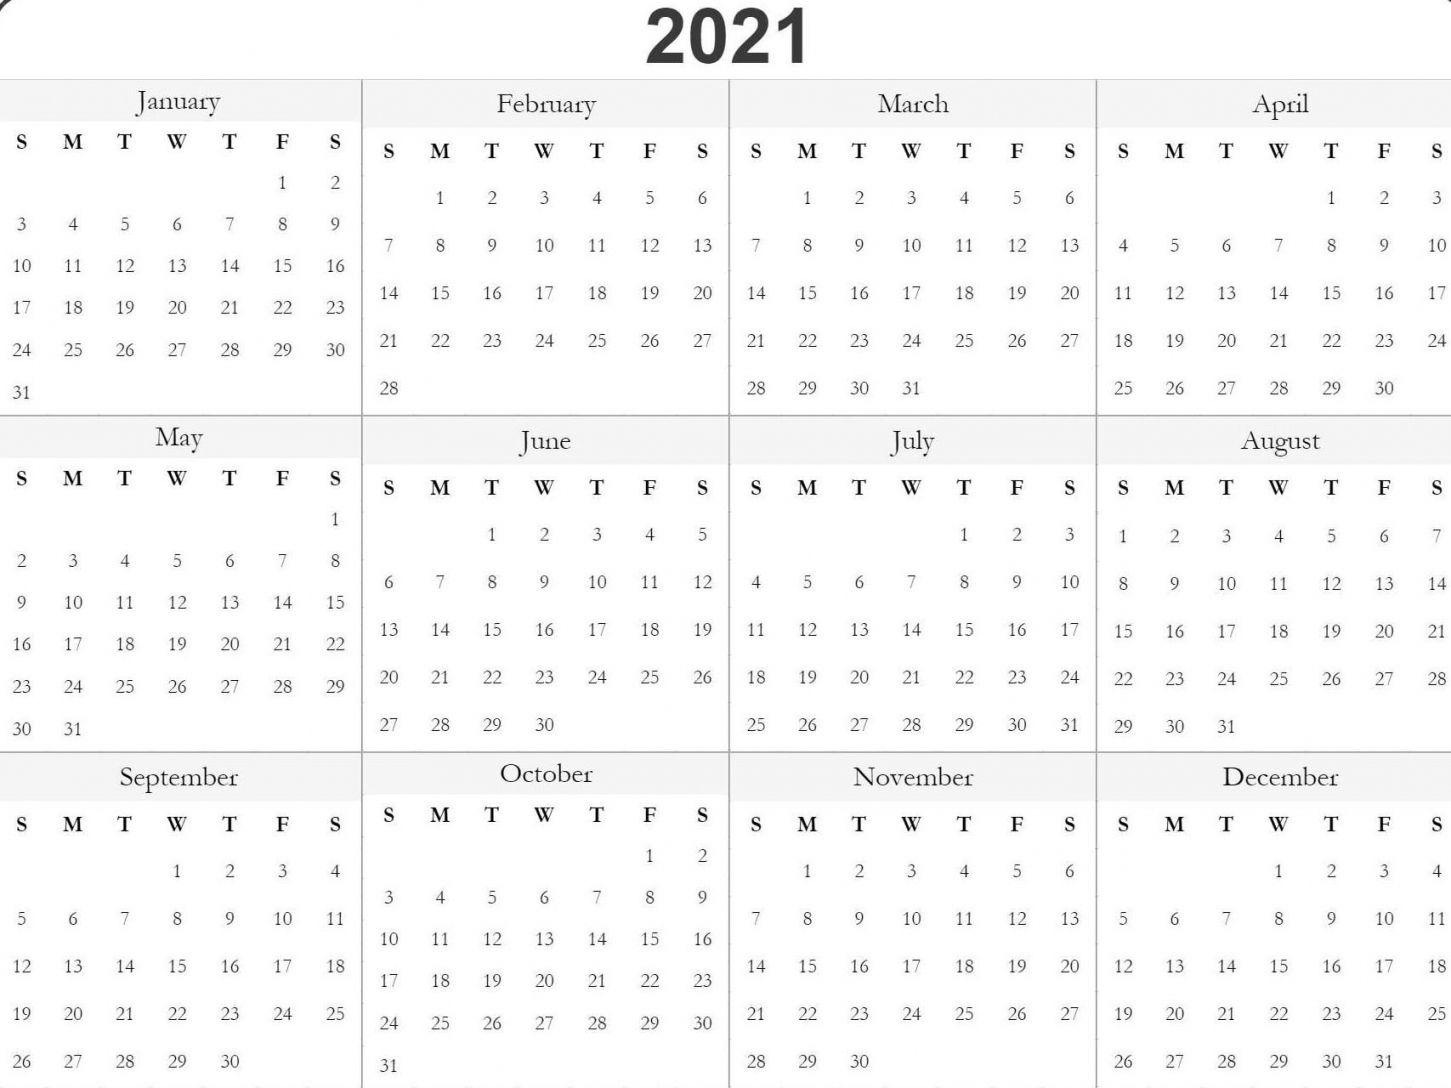 Julian Date 2021 | Calendar Template 2021 For Julian Date Conversion 2022